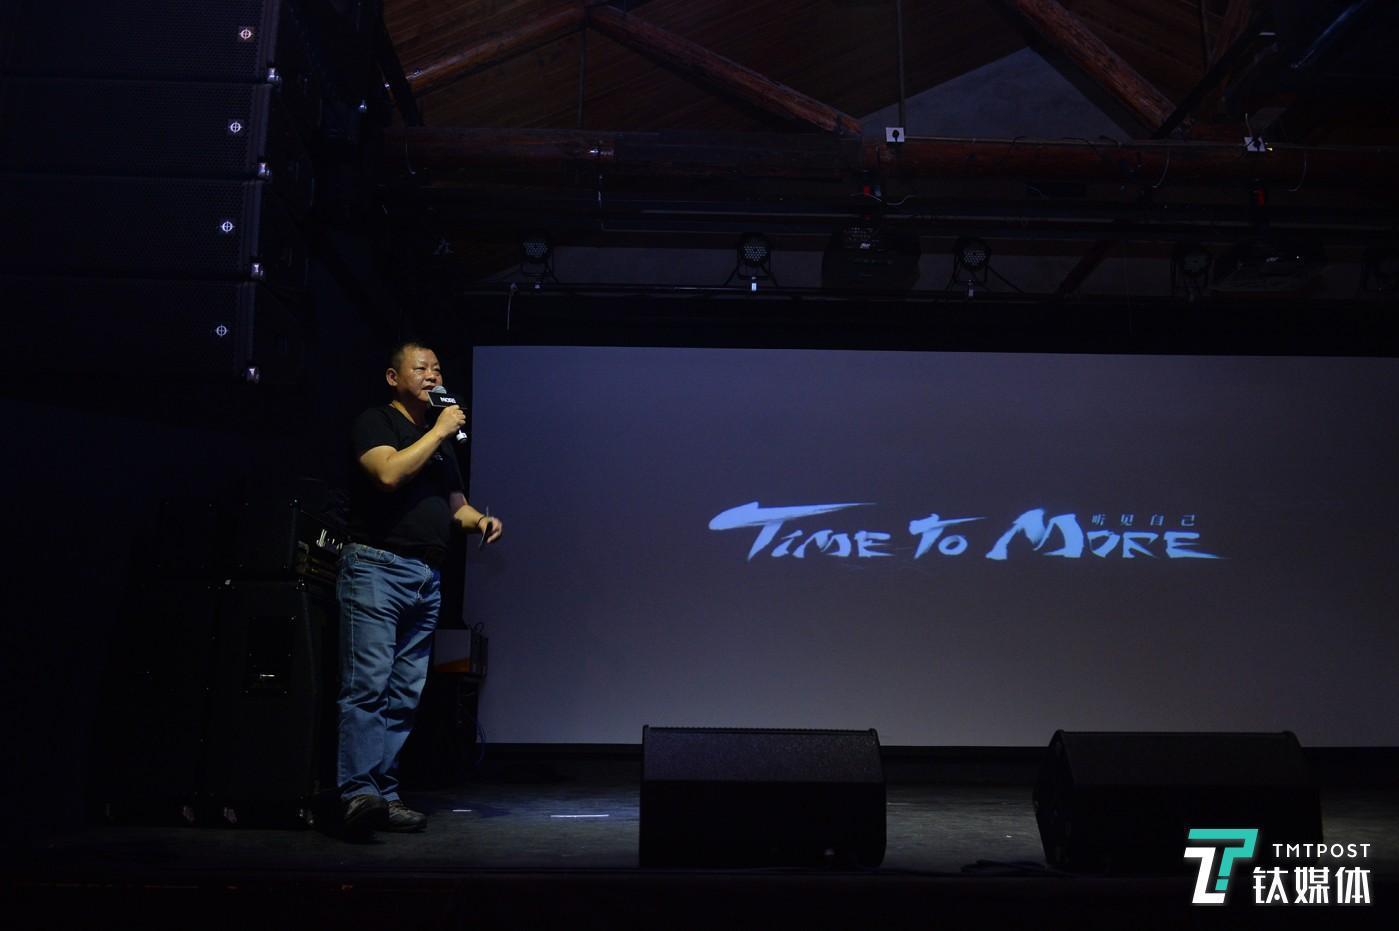 MORE黑胶唱机总设计师余锦辉先生 介绍新品特点